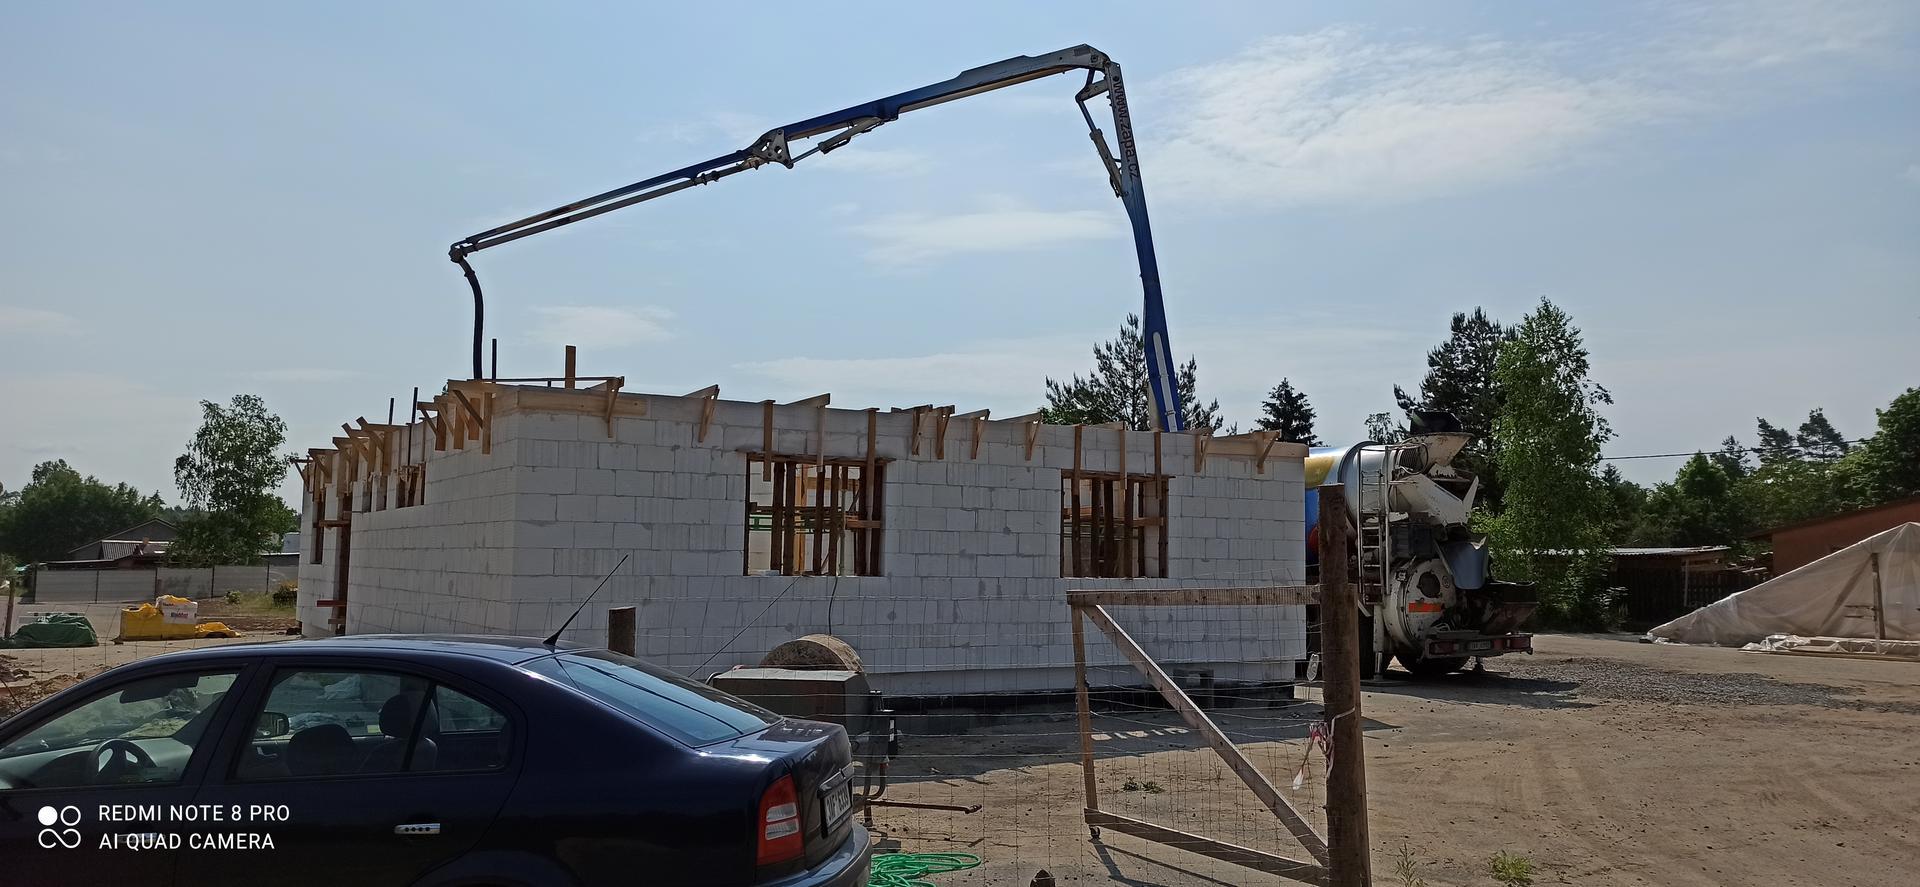 Hrubá stavba - Obrázek č. 201